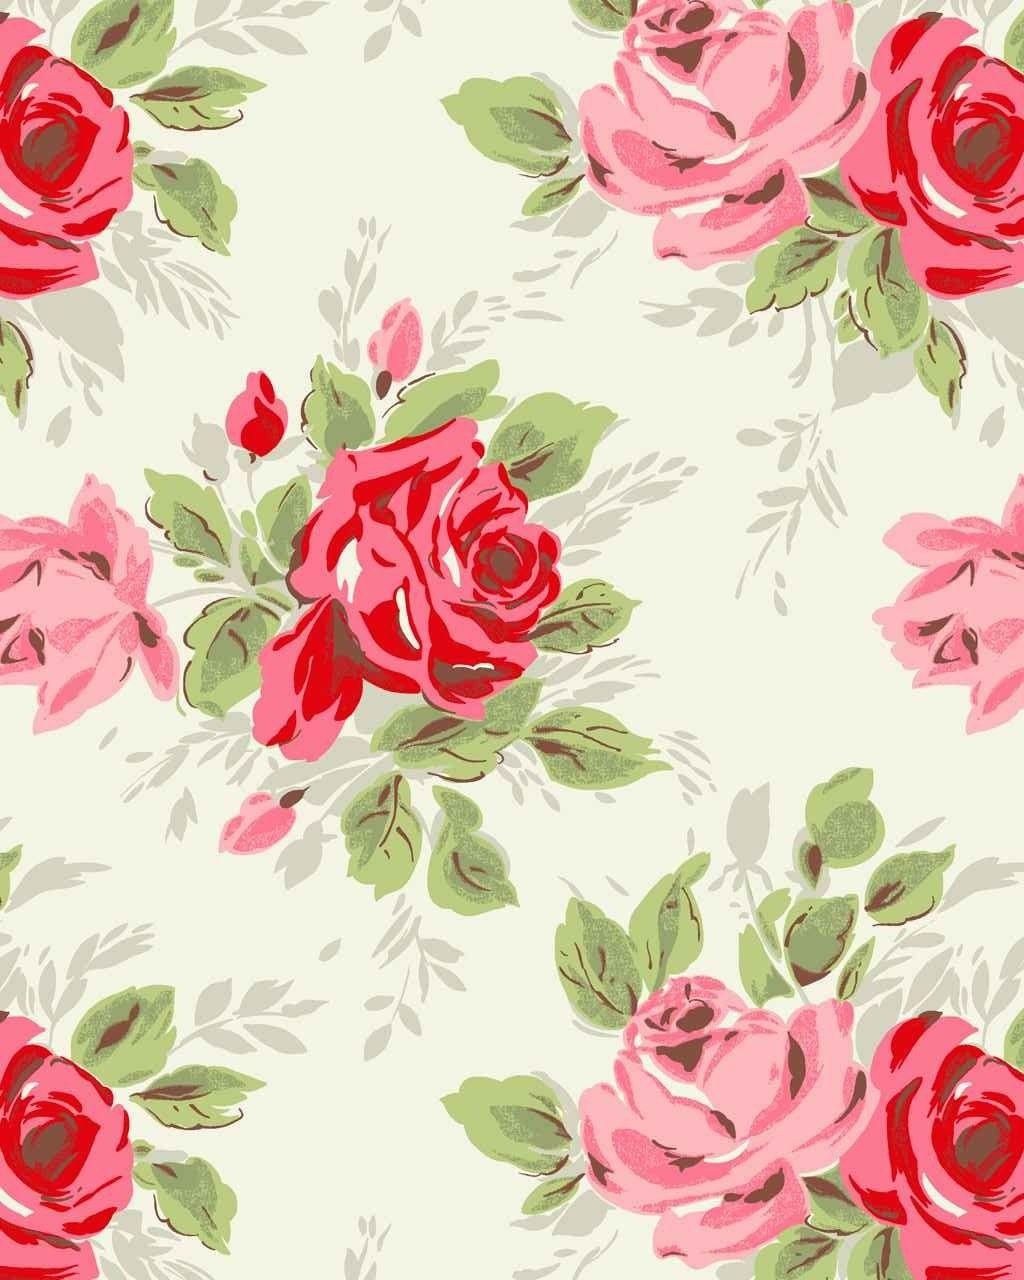 Flower Iphone Wallpaper: Pin By Barbara Lane On Paper / Beautiful Paper